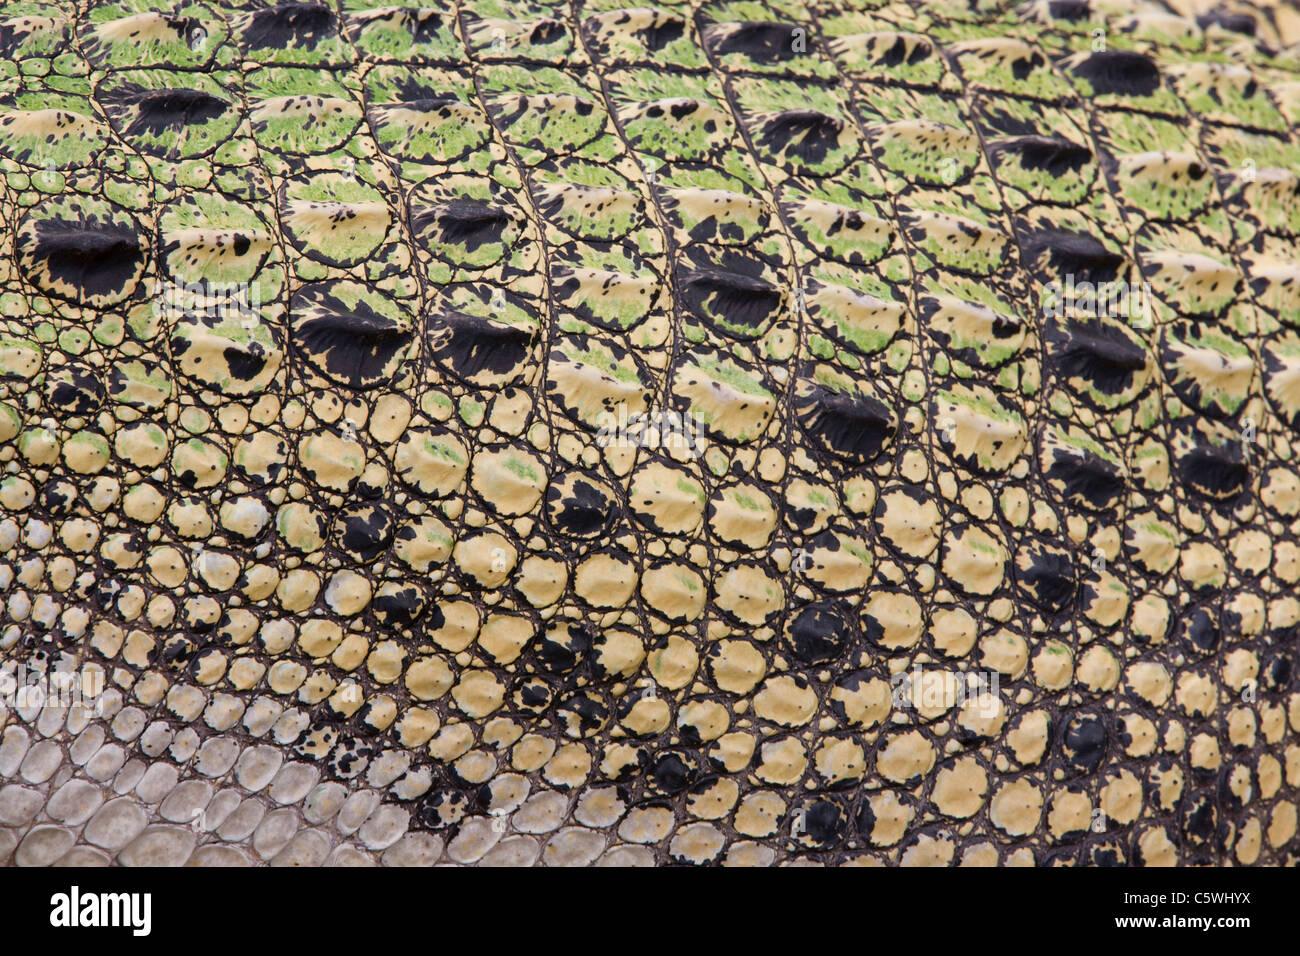 Scales of saltwater crocodile (Crocodylus porosus), full frame - Stock Image